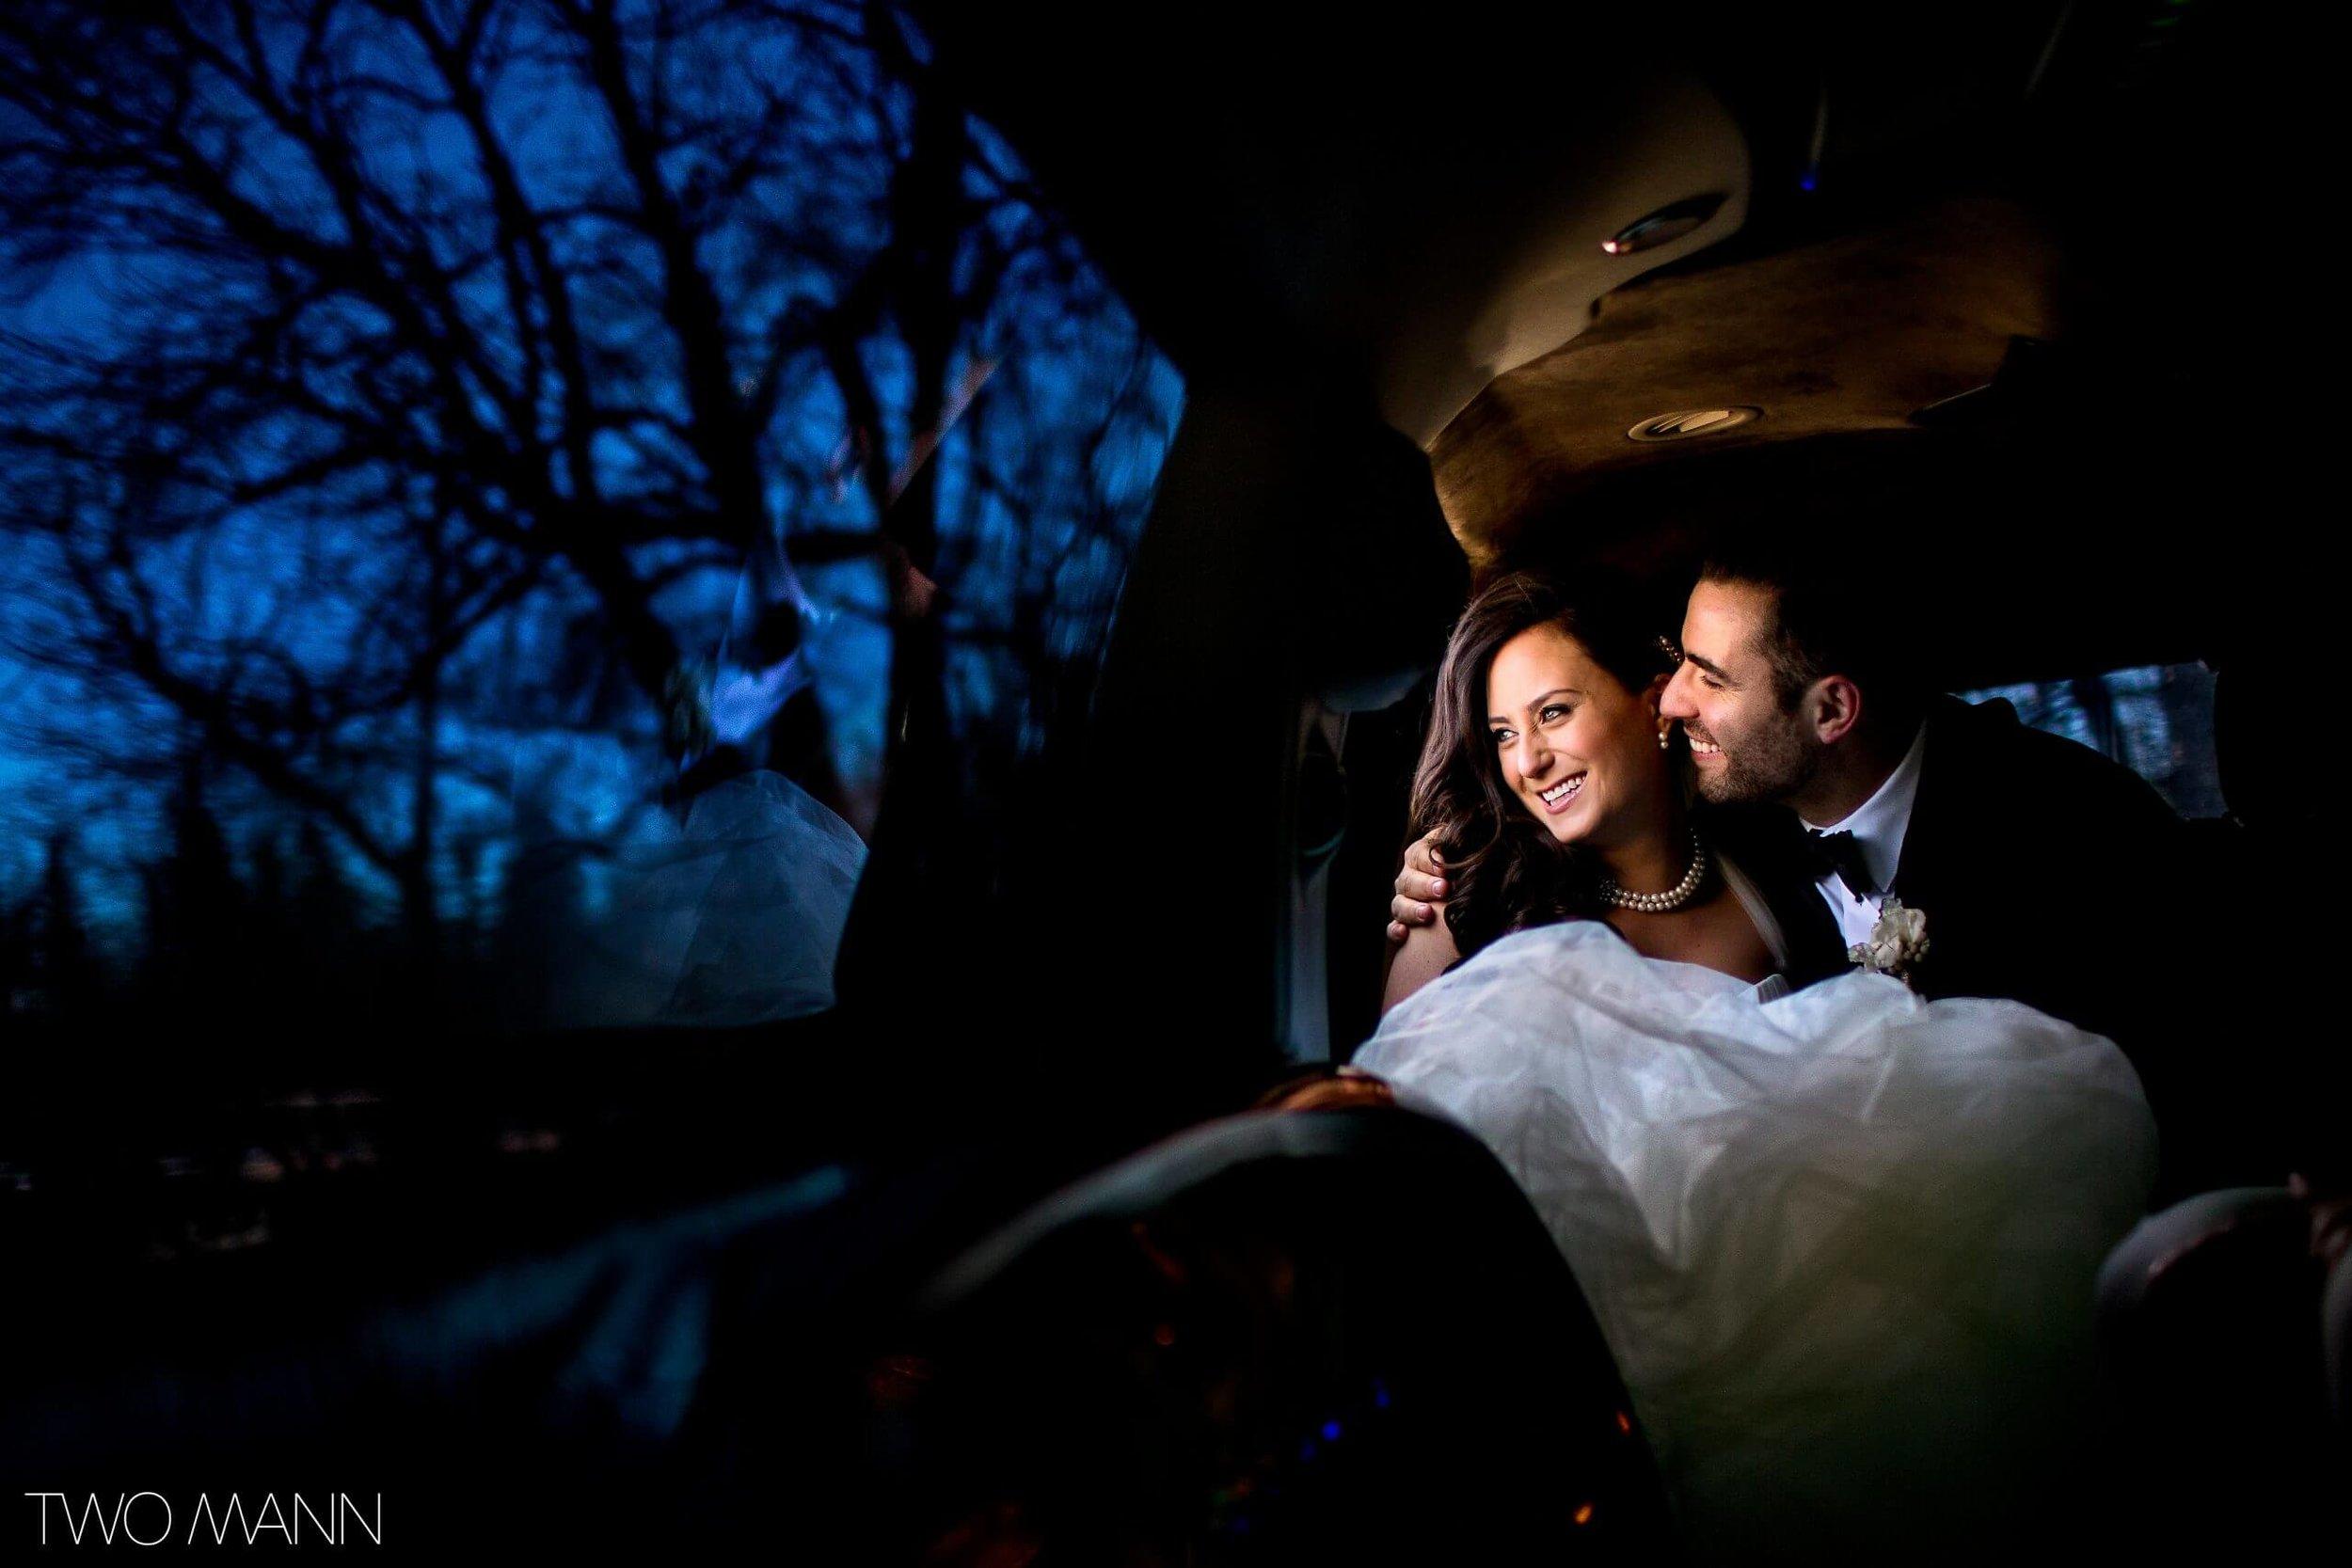 Two-Mann-Studios-Worlds-Best-Wedding-Photography-Best-of-2016-004-2560x1707.jpg